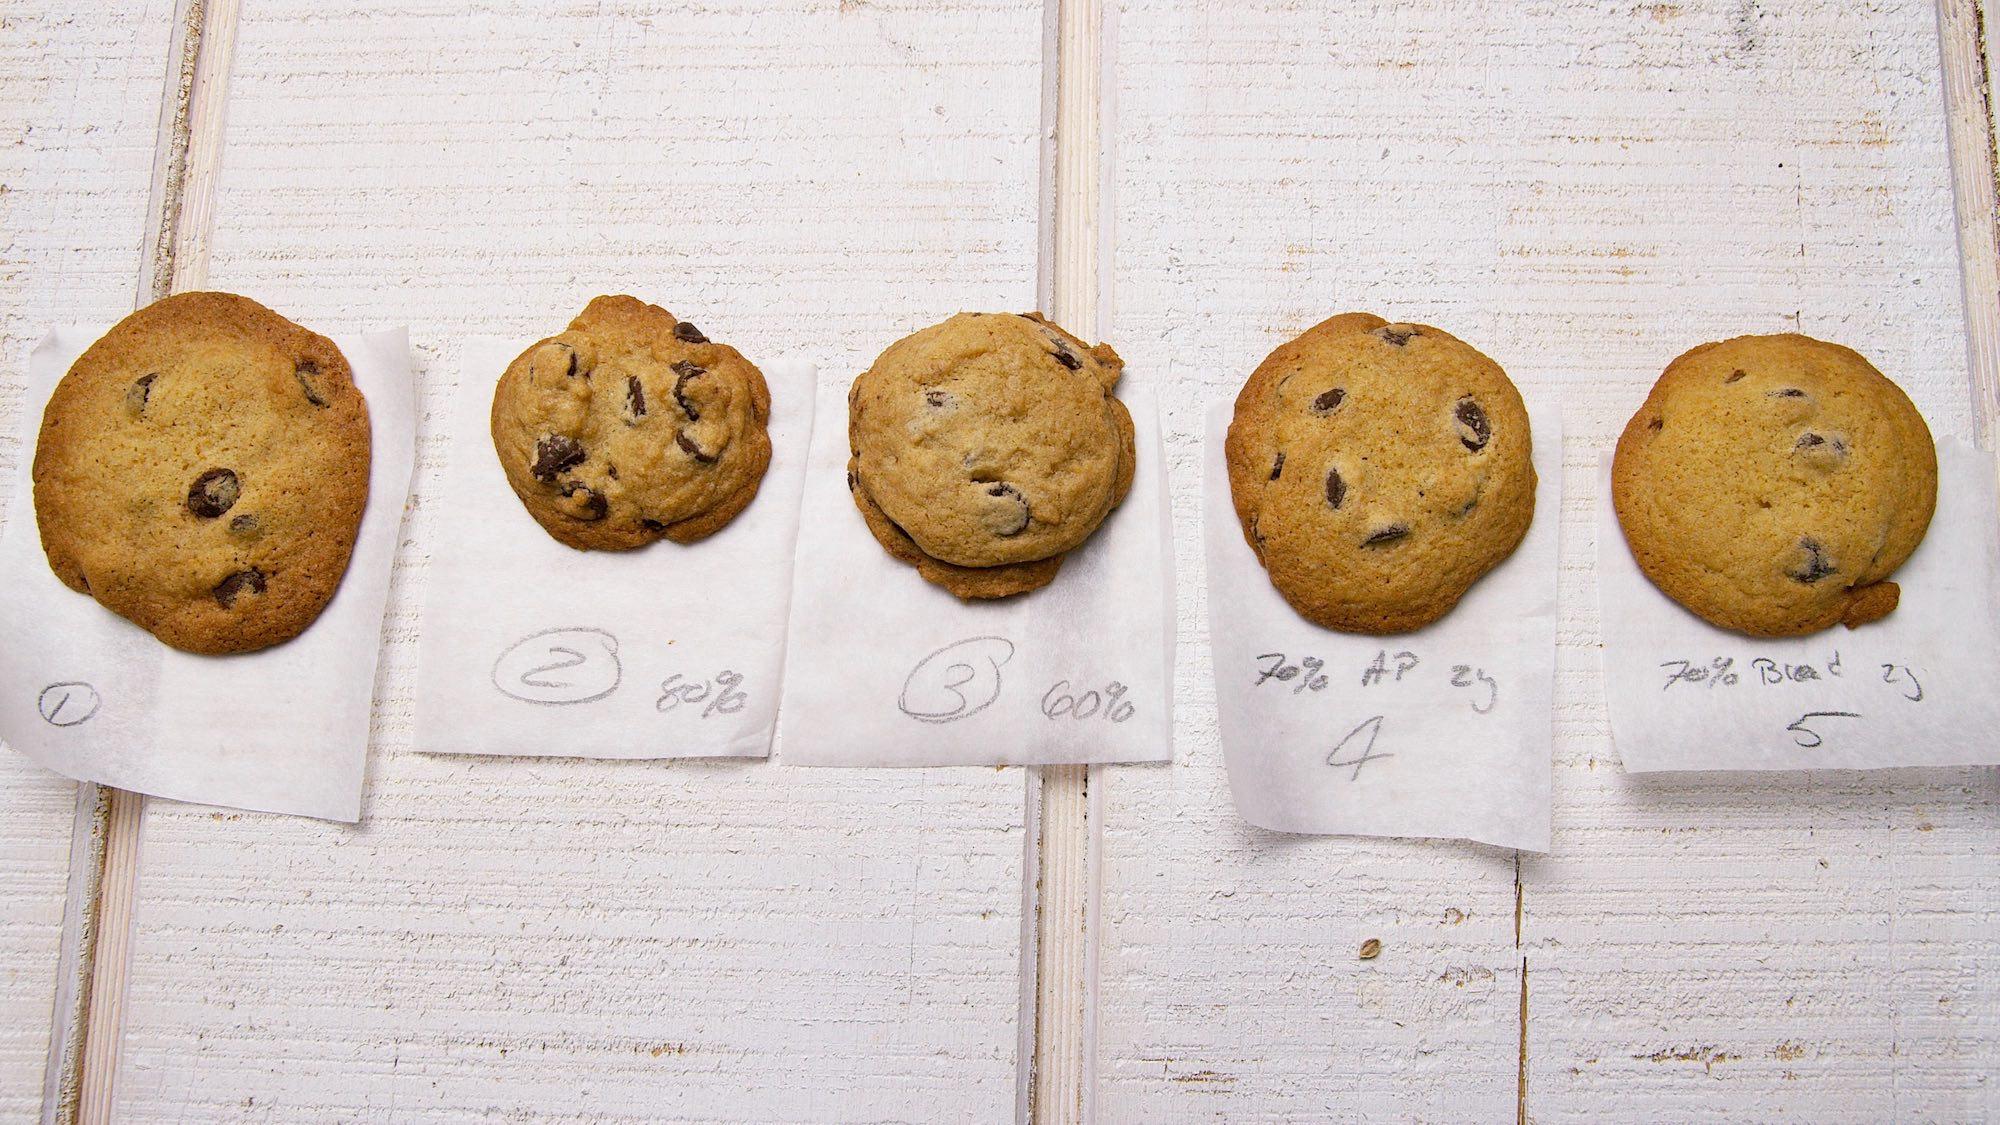 Anatomy Of A Cookie Part 2 E 2000.jpeg